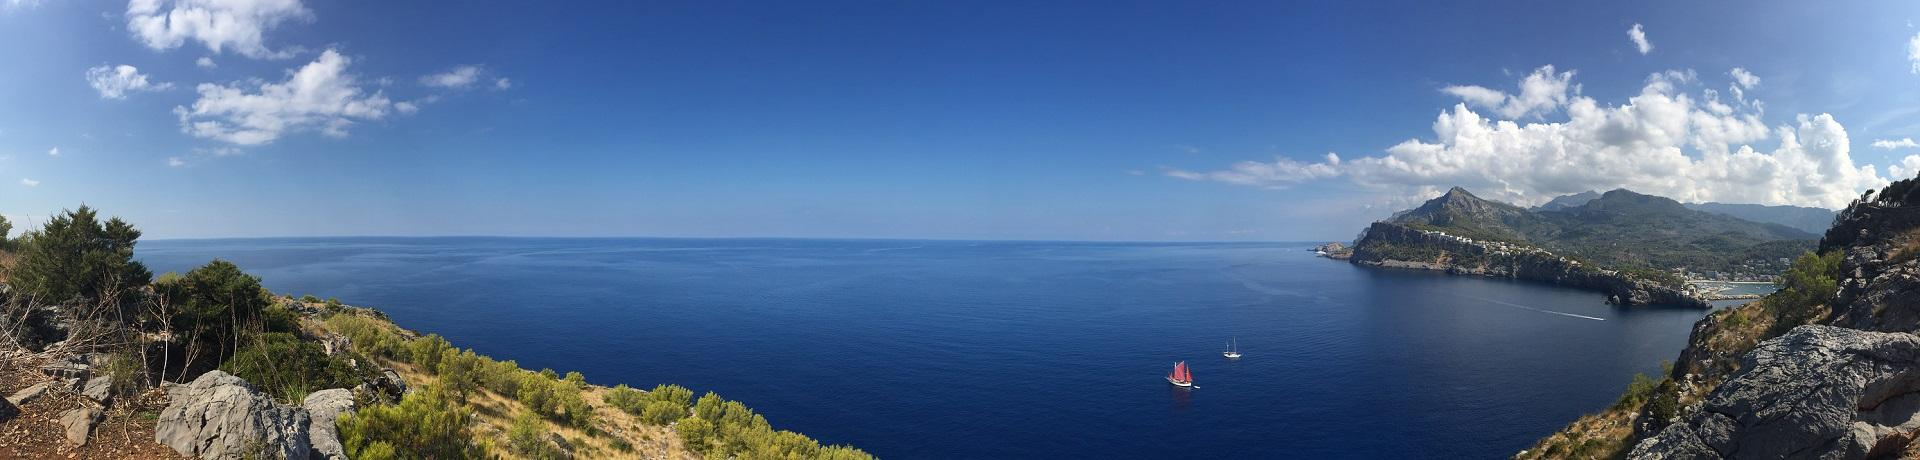 Spanien: Mallorca - Port de Soller I - Emotion (CR)